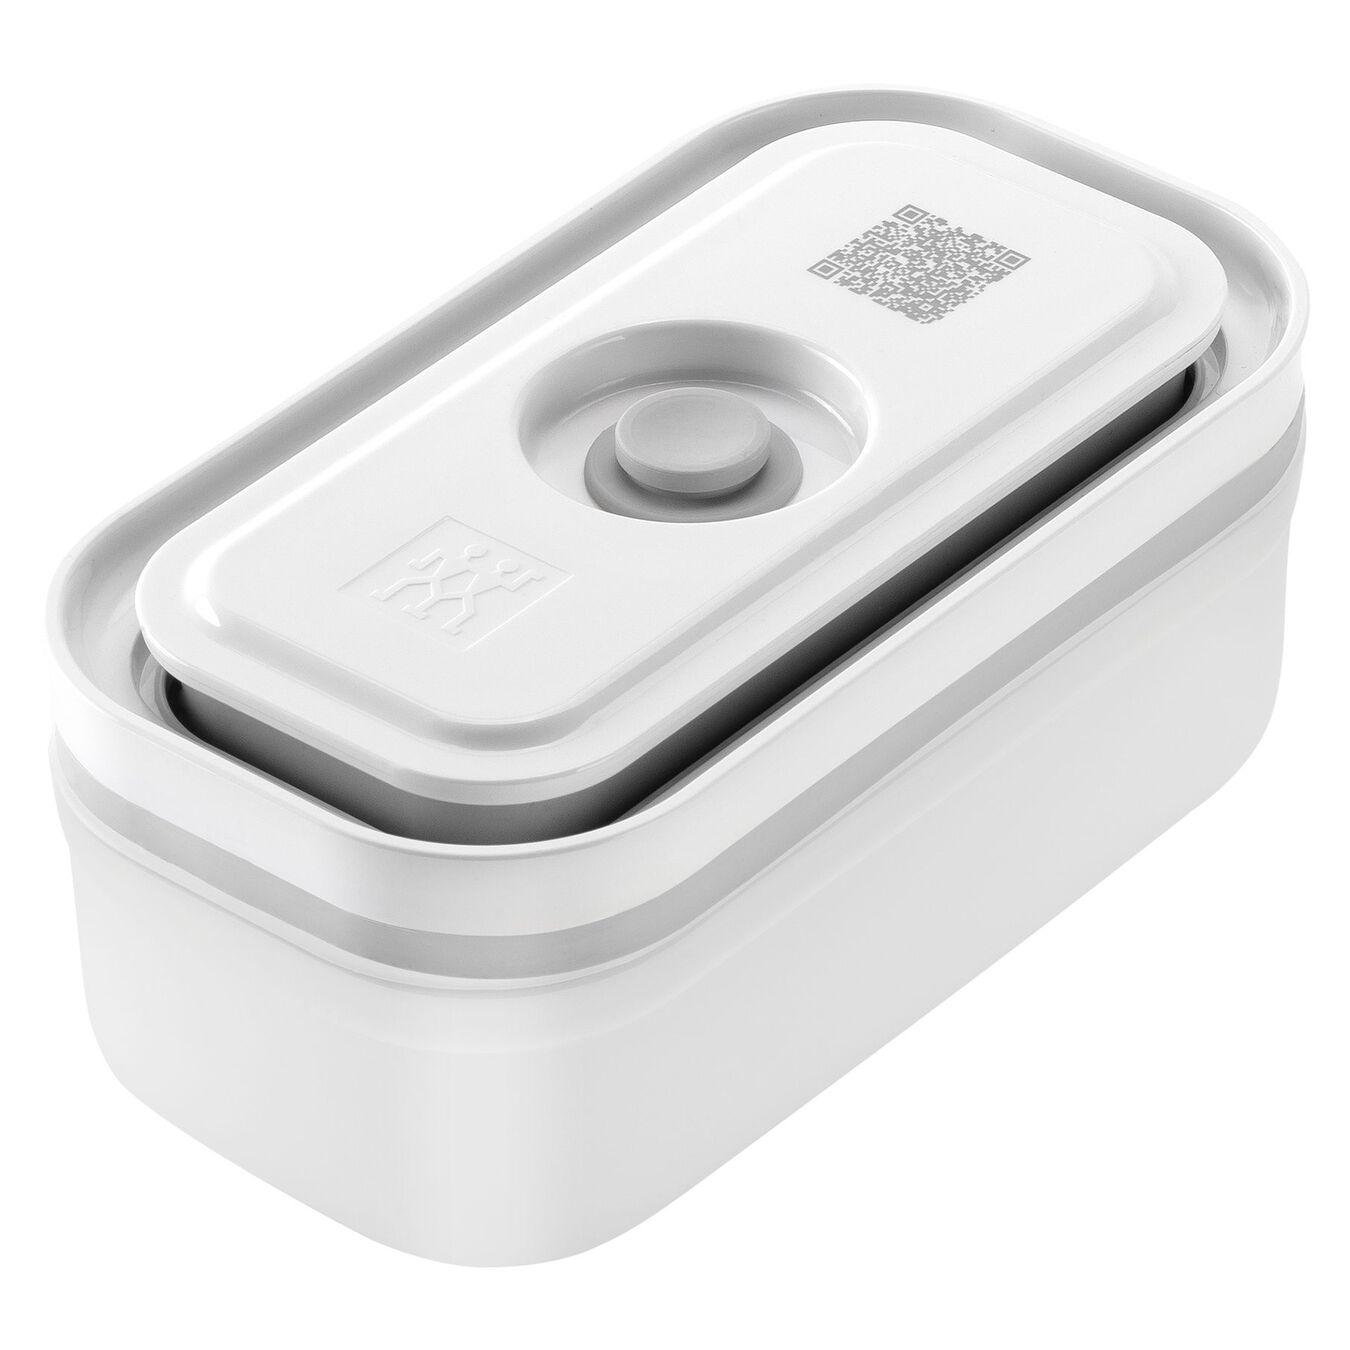 Vakuum box - S - Plast - Semitransparent-Grå,,large 1